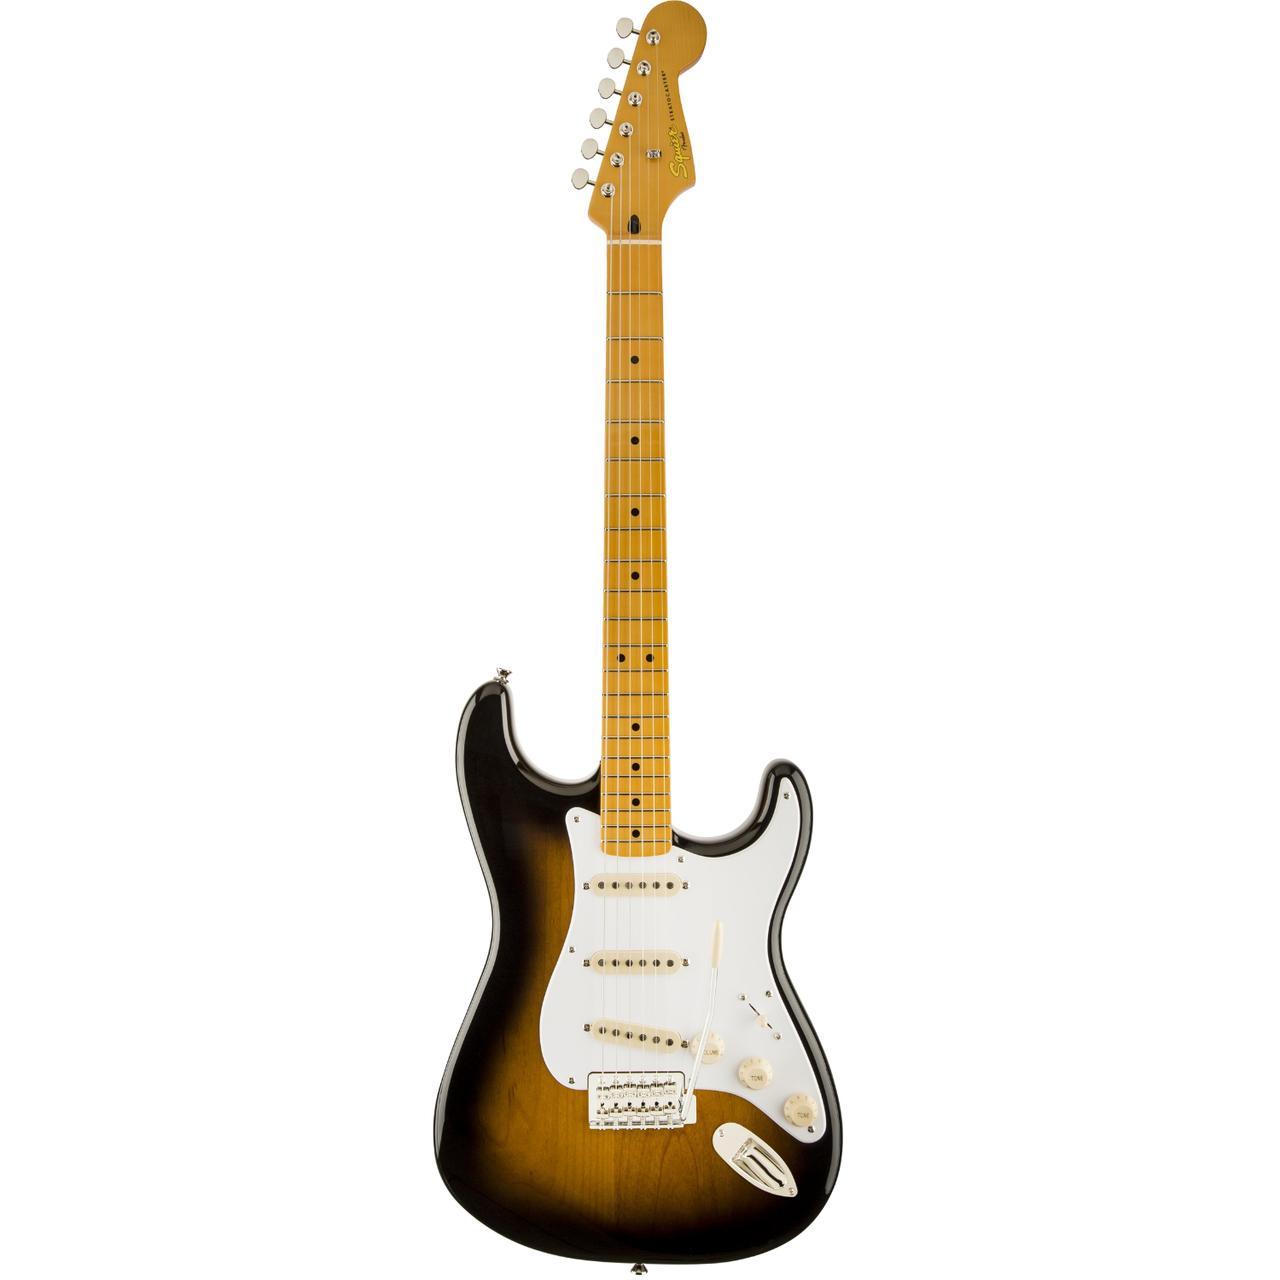 Squier Classic Vibe 50's Stratocaster 2-Tone Sunburst